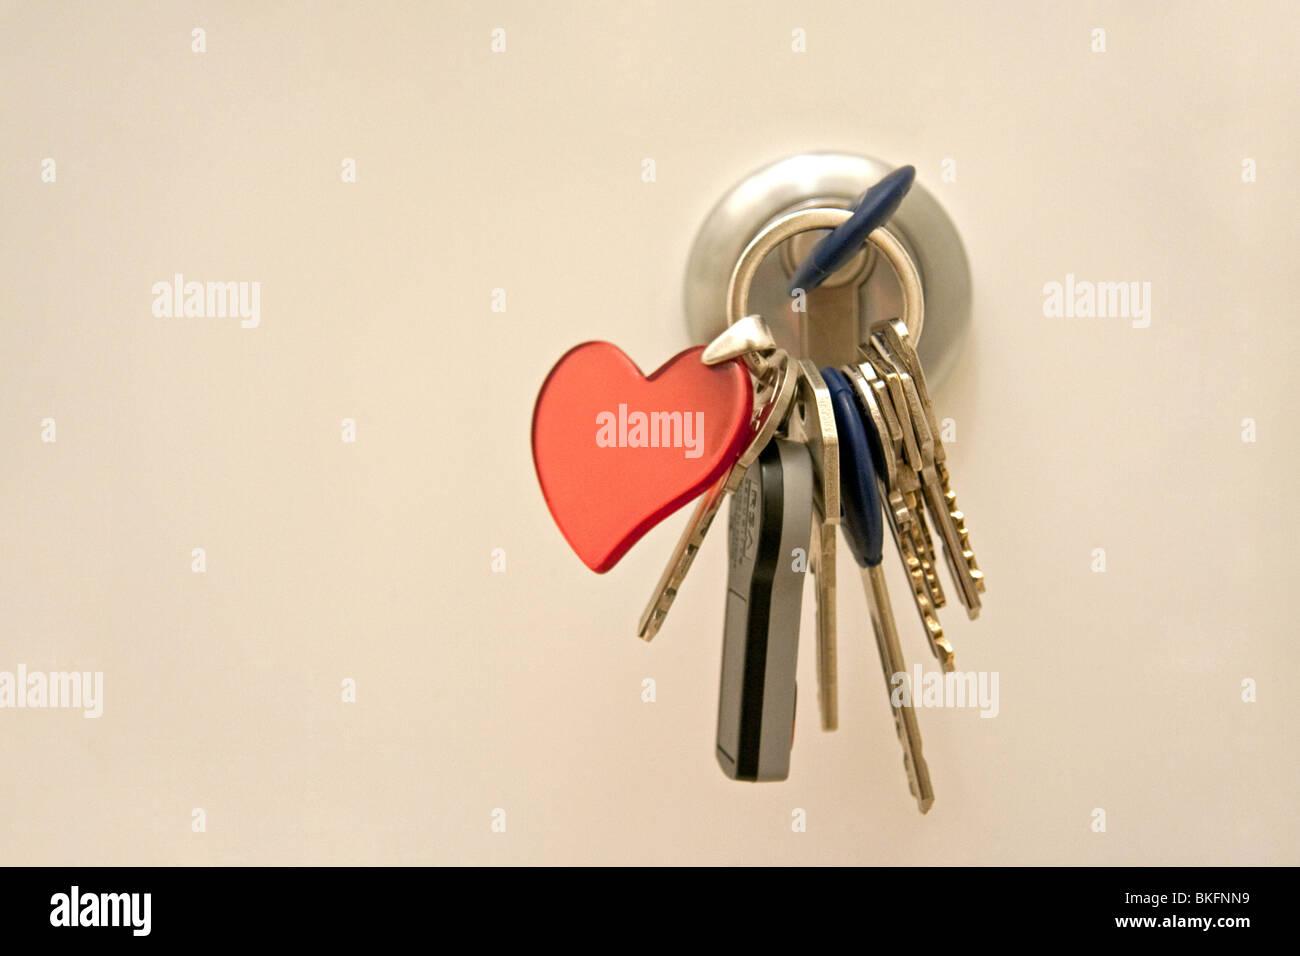 Türschloss mit Schlüssel-Kette Stockbild